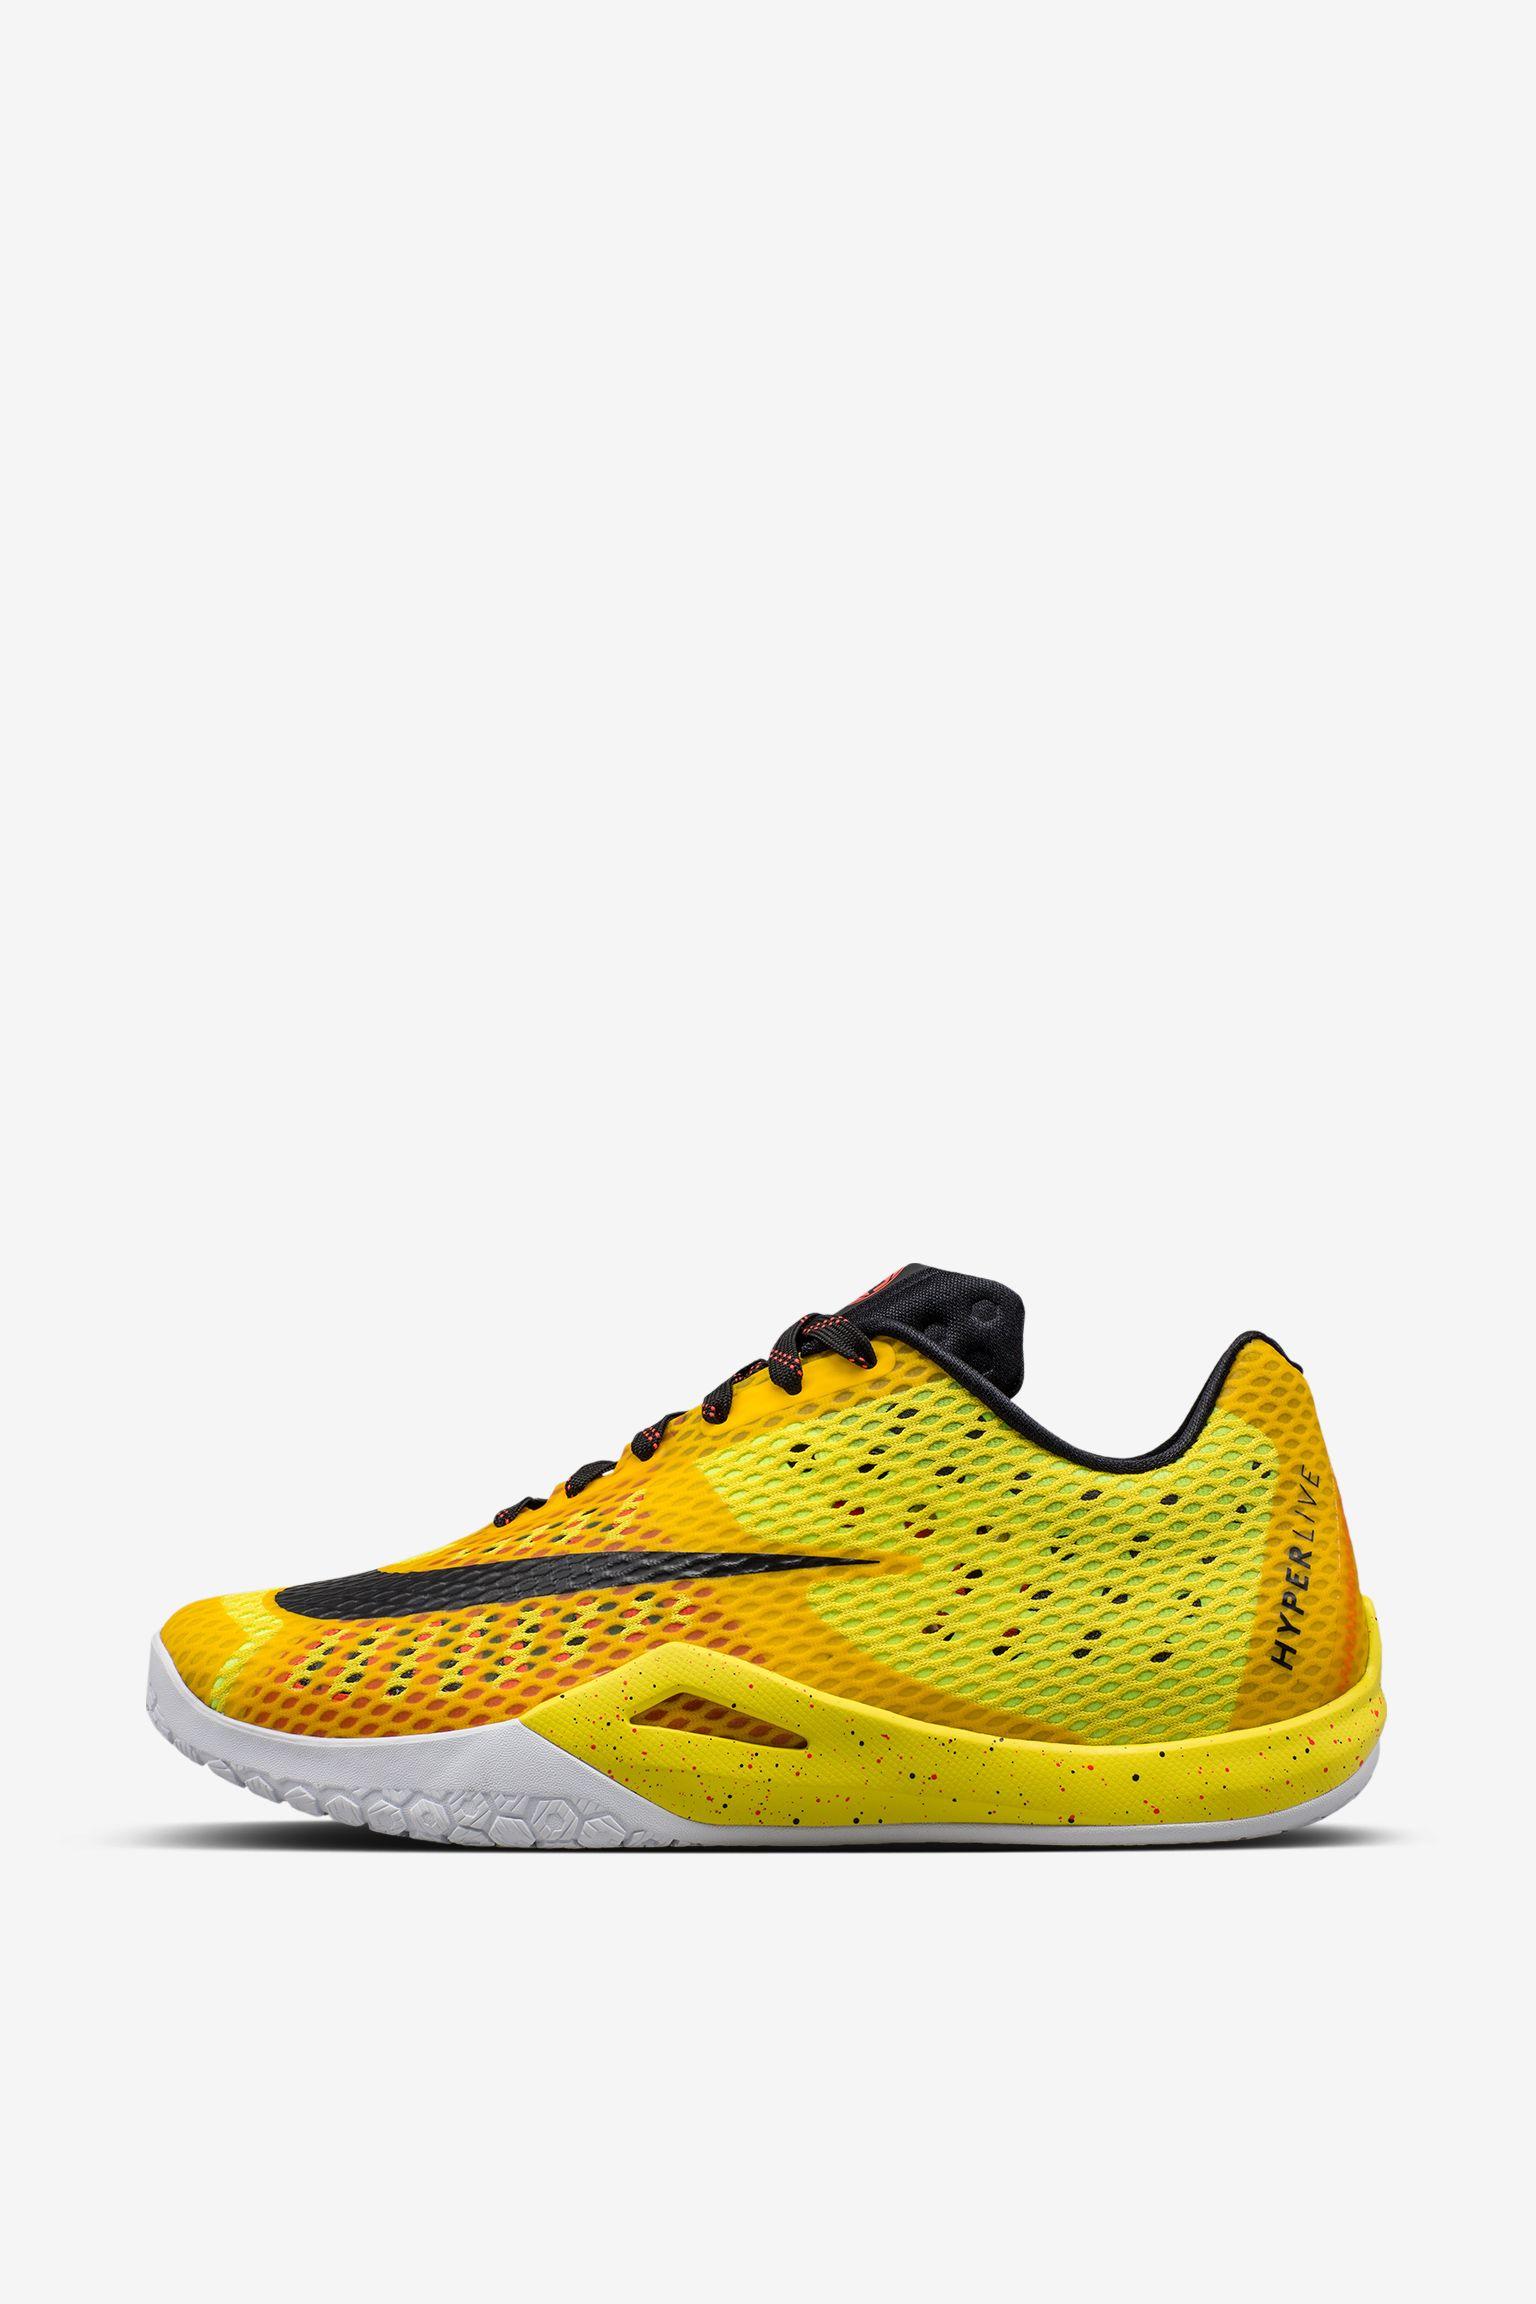 Nike Hyperlive 2 'EYBL'